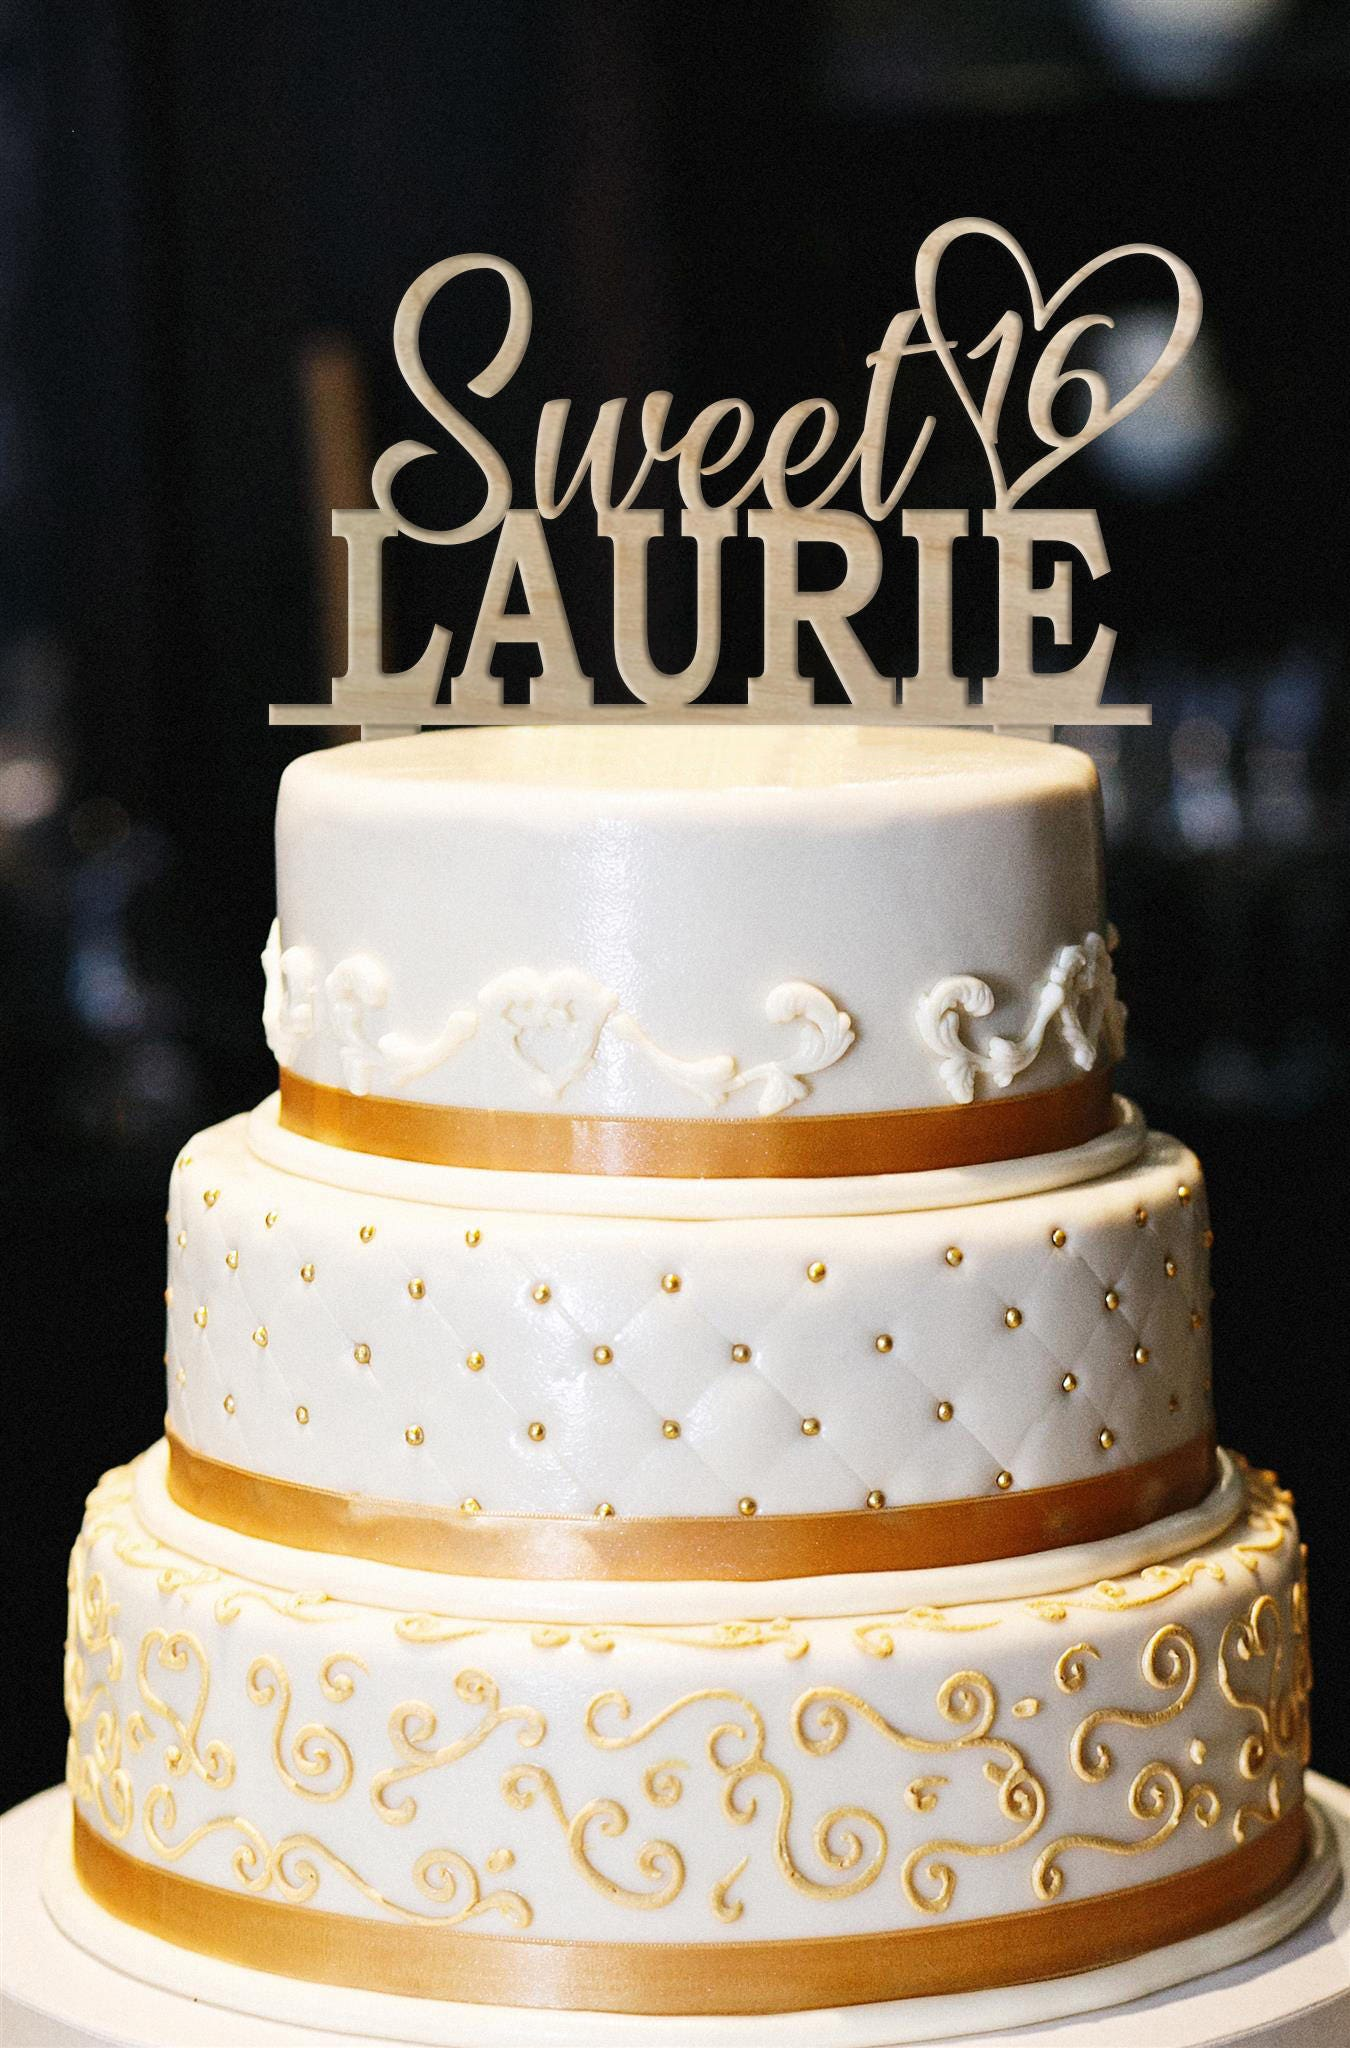 Sweet 16 Cake Topper Wood Sweet 16th Birthday Cake Topper ...